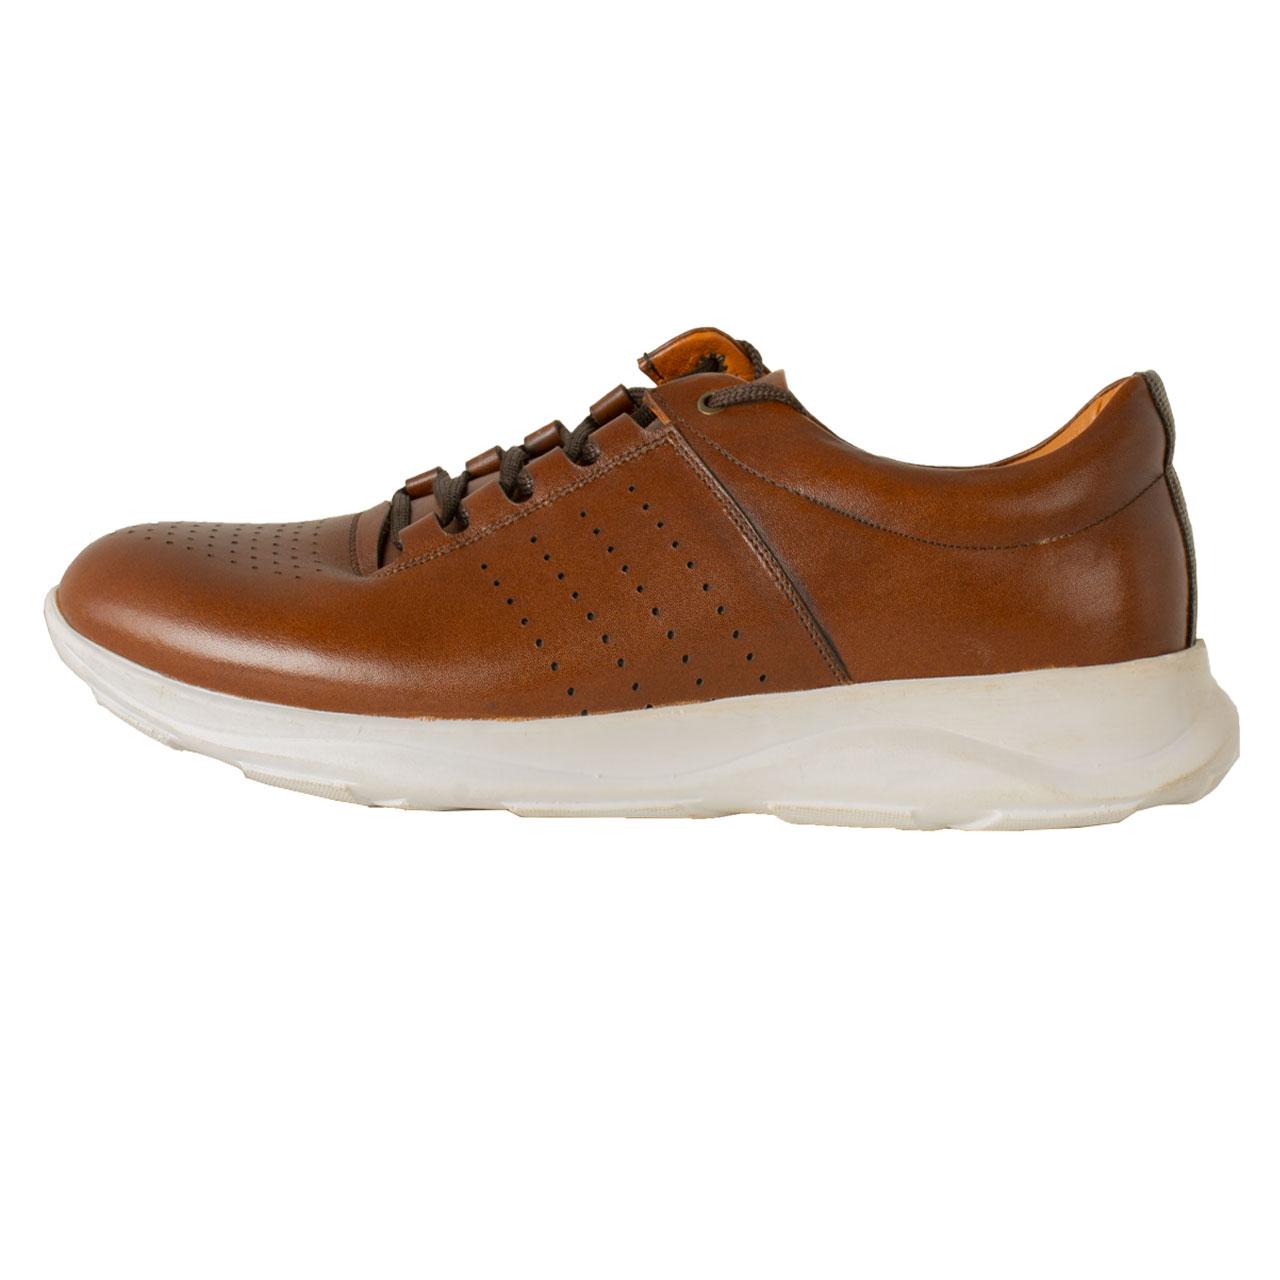 PARINECHARM leather men's casual shoes , SHO176 Model